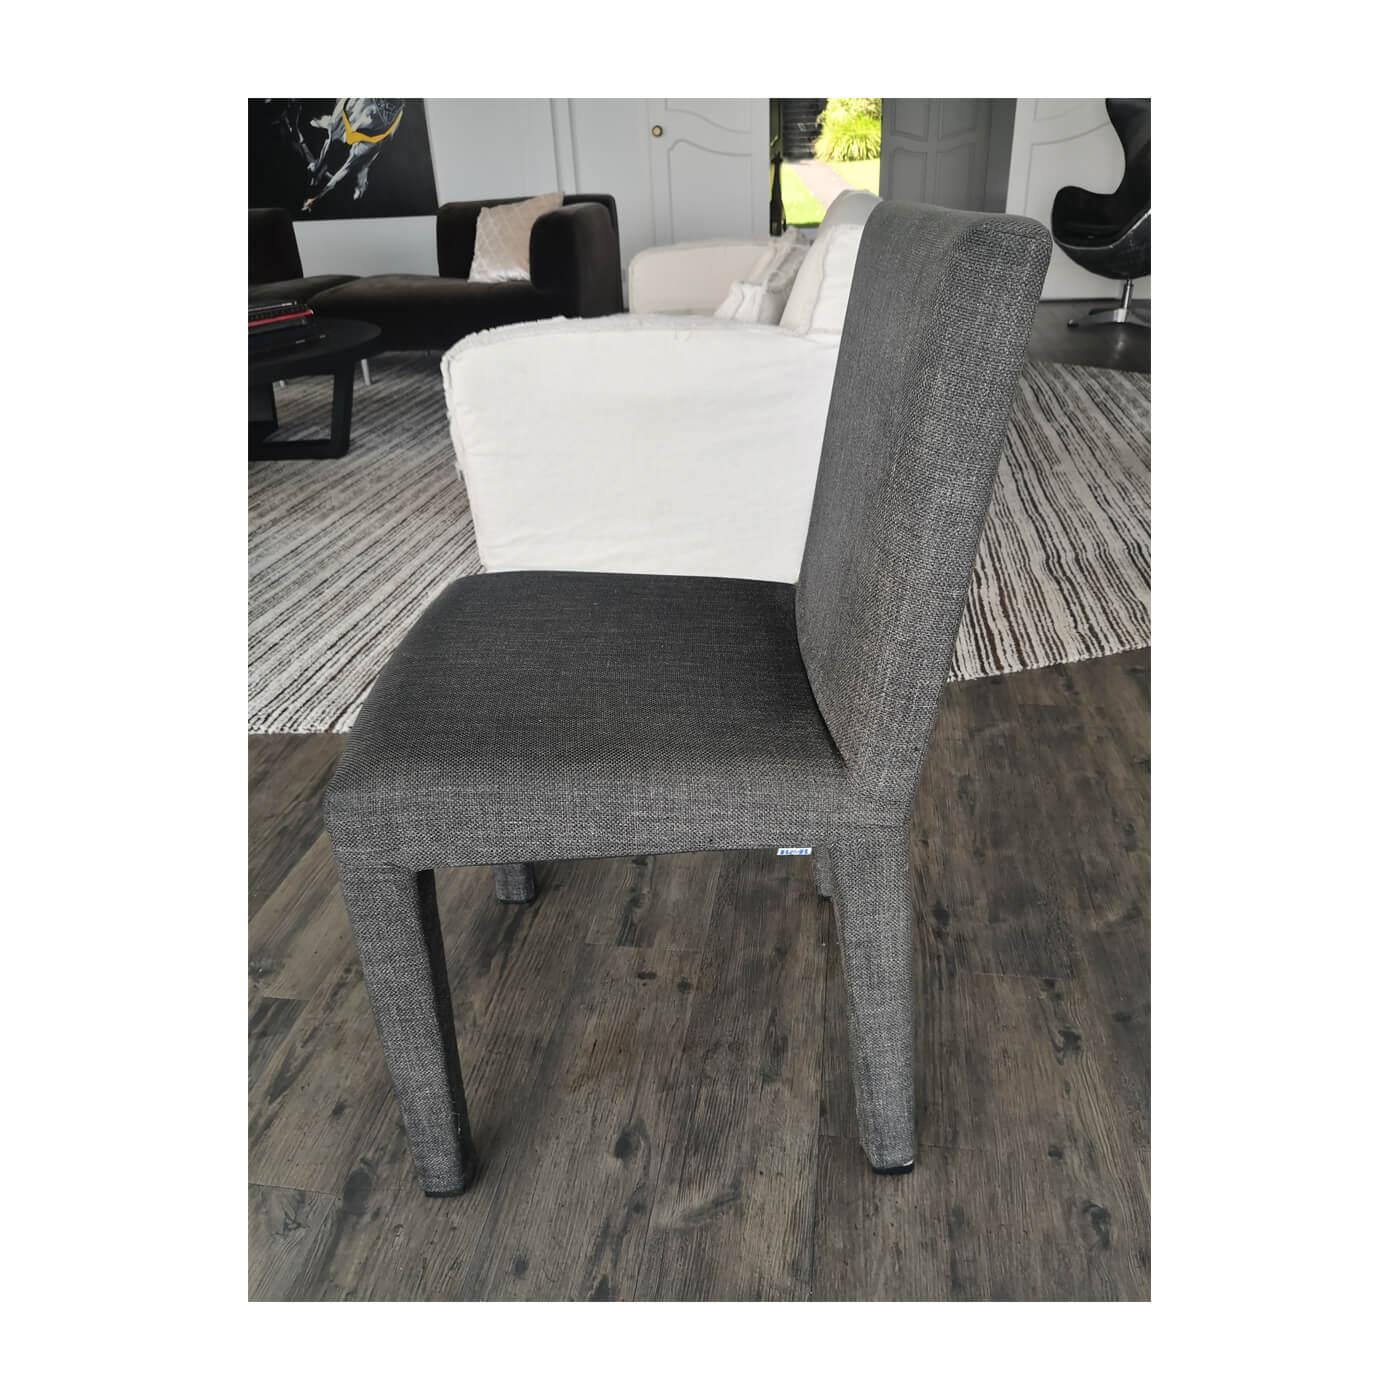 B&B Italia Panama Dining Chairs